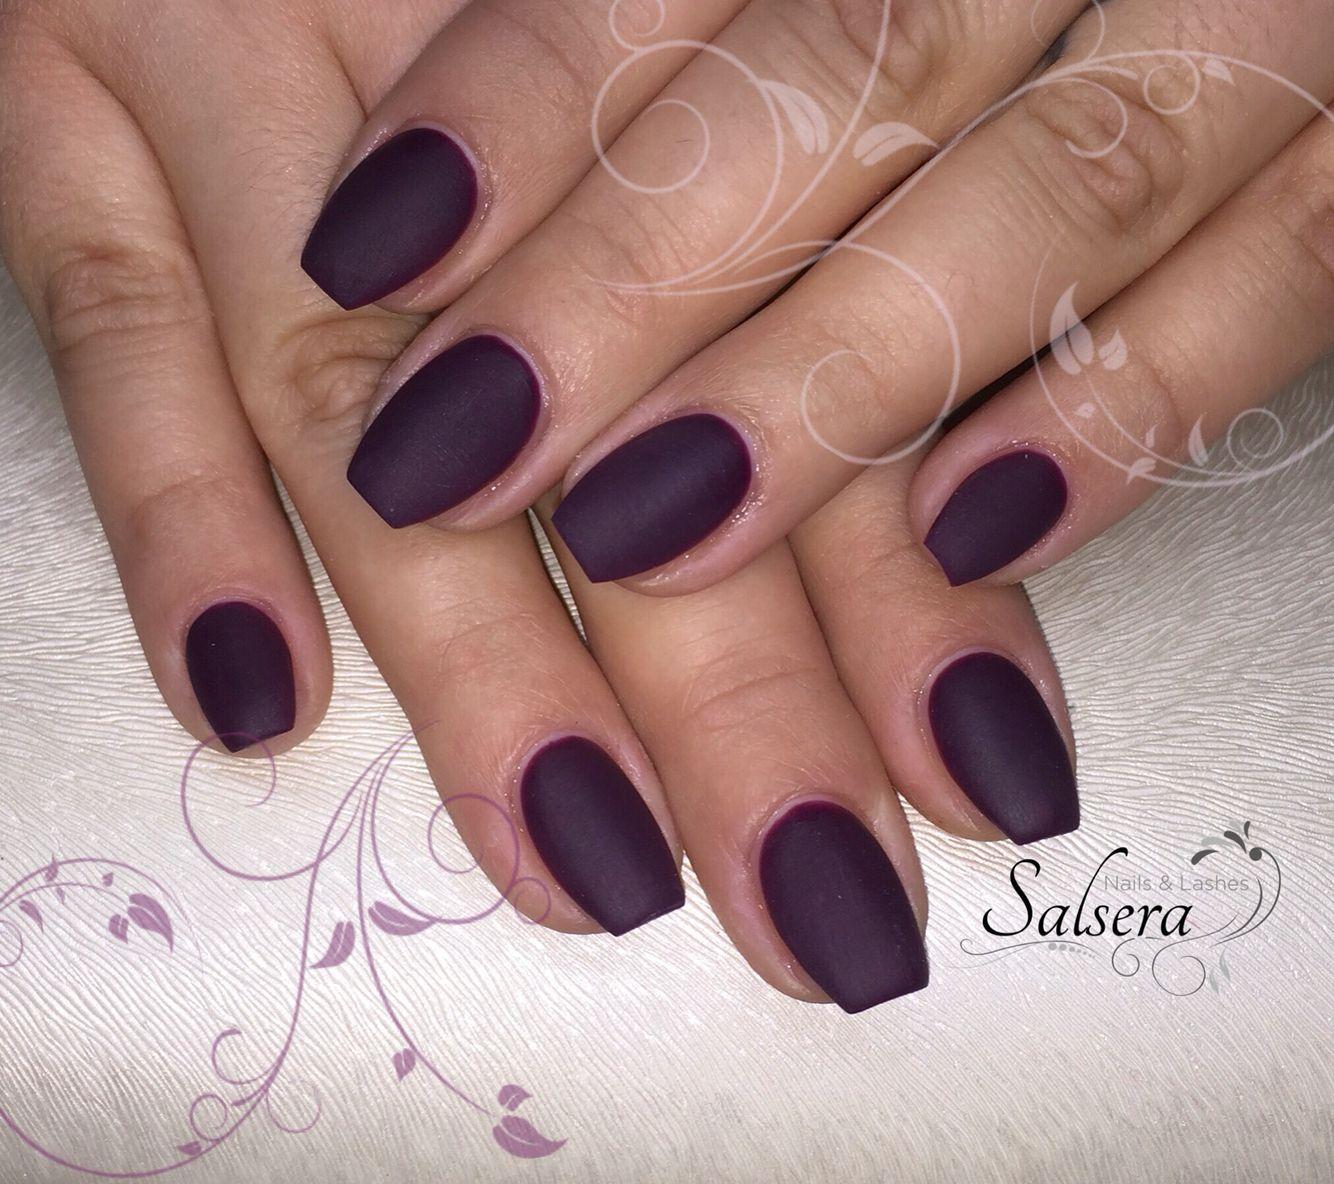 Nails Nu00e4gel Ballerina Matt Plum Lila Bordeaux Fullcover Salsera Nails U0026 Lashes | Nails ...